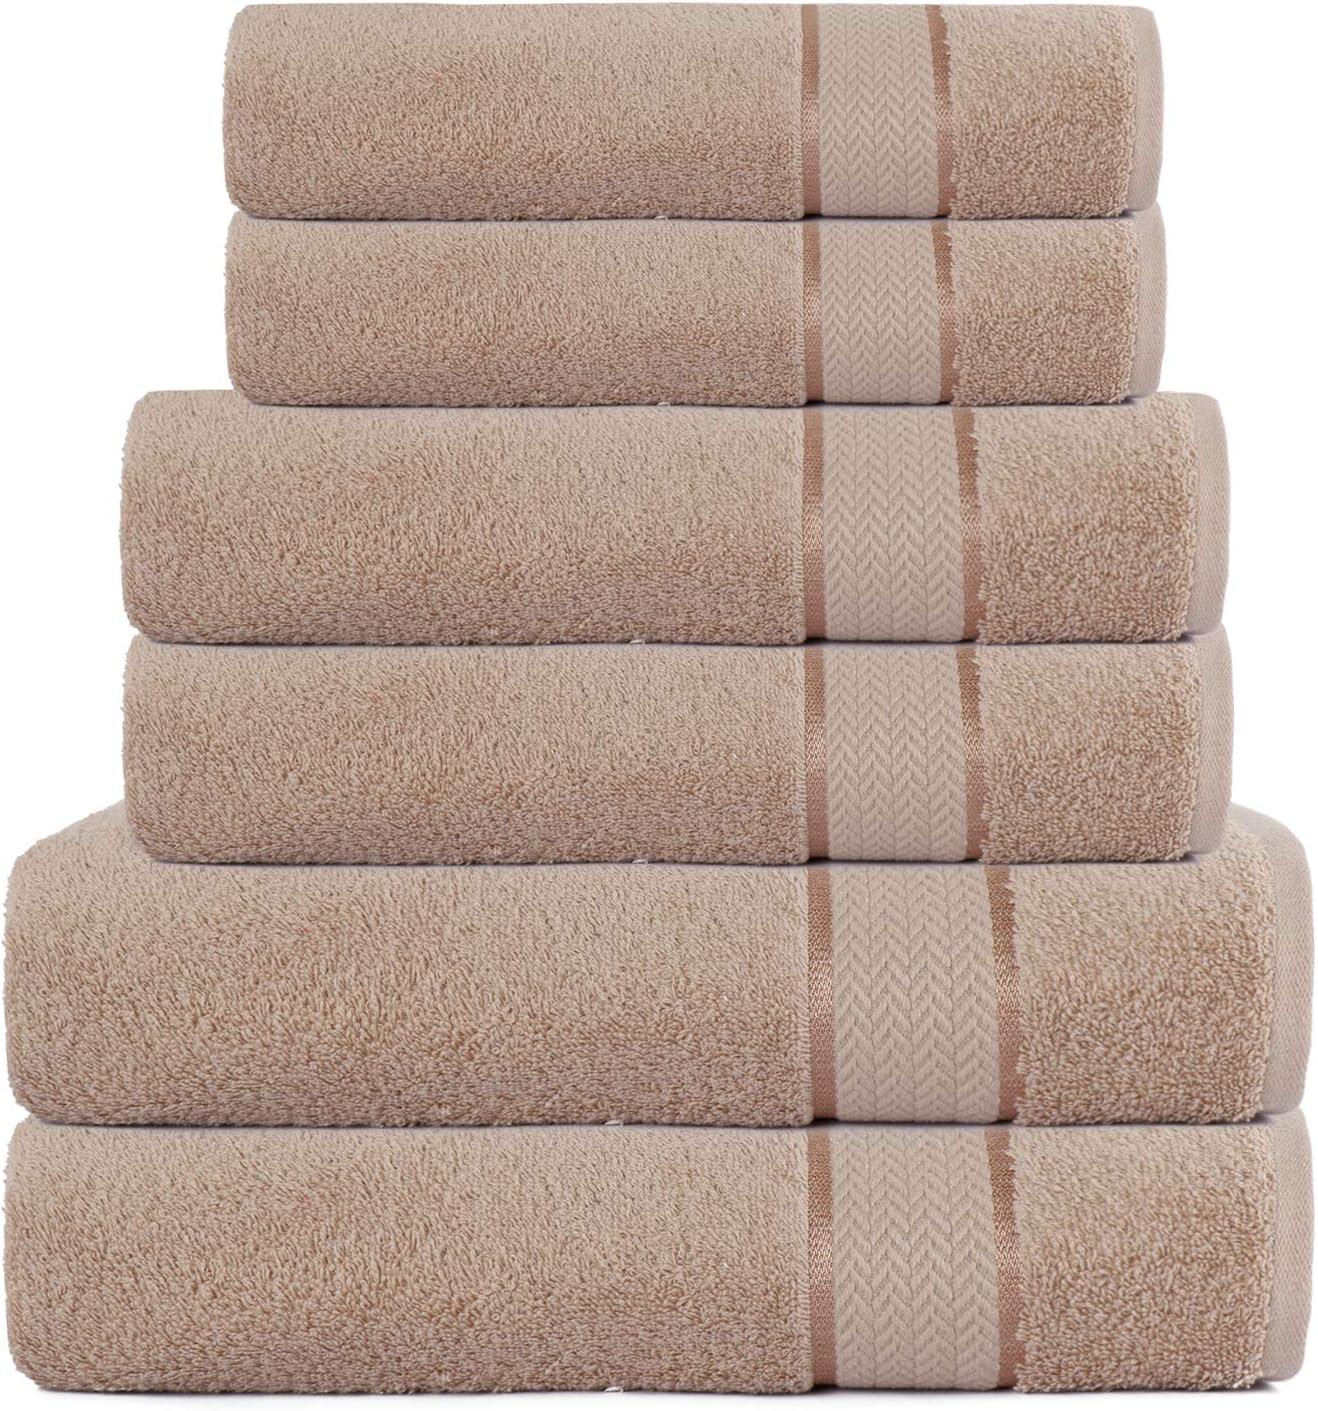 100% Cotton 6 Piece Bathroom Towel Set – 2 Bath Towels 30x54– 2 Hand Towels 16x28 – 2 Washcloths 12x12 – Soft Absorbent Towels – Plush Towel Set – Luxury Ultra Soft Towel Set – Linen